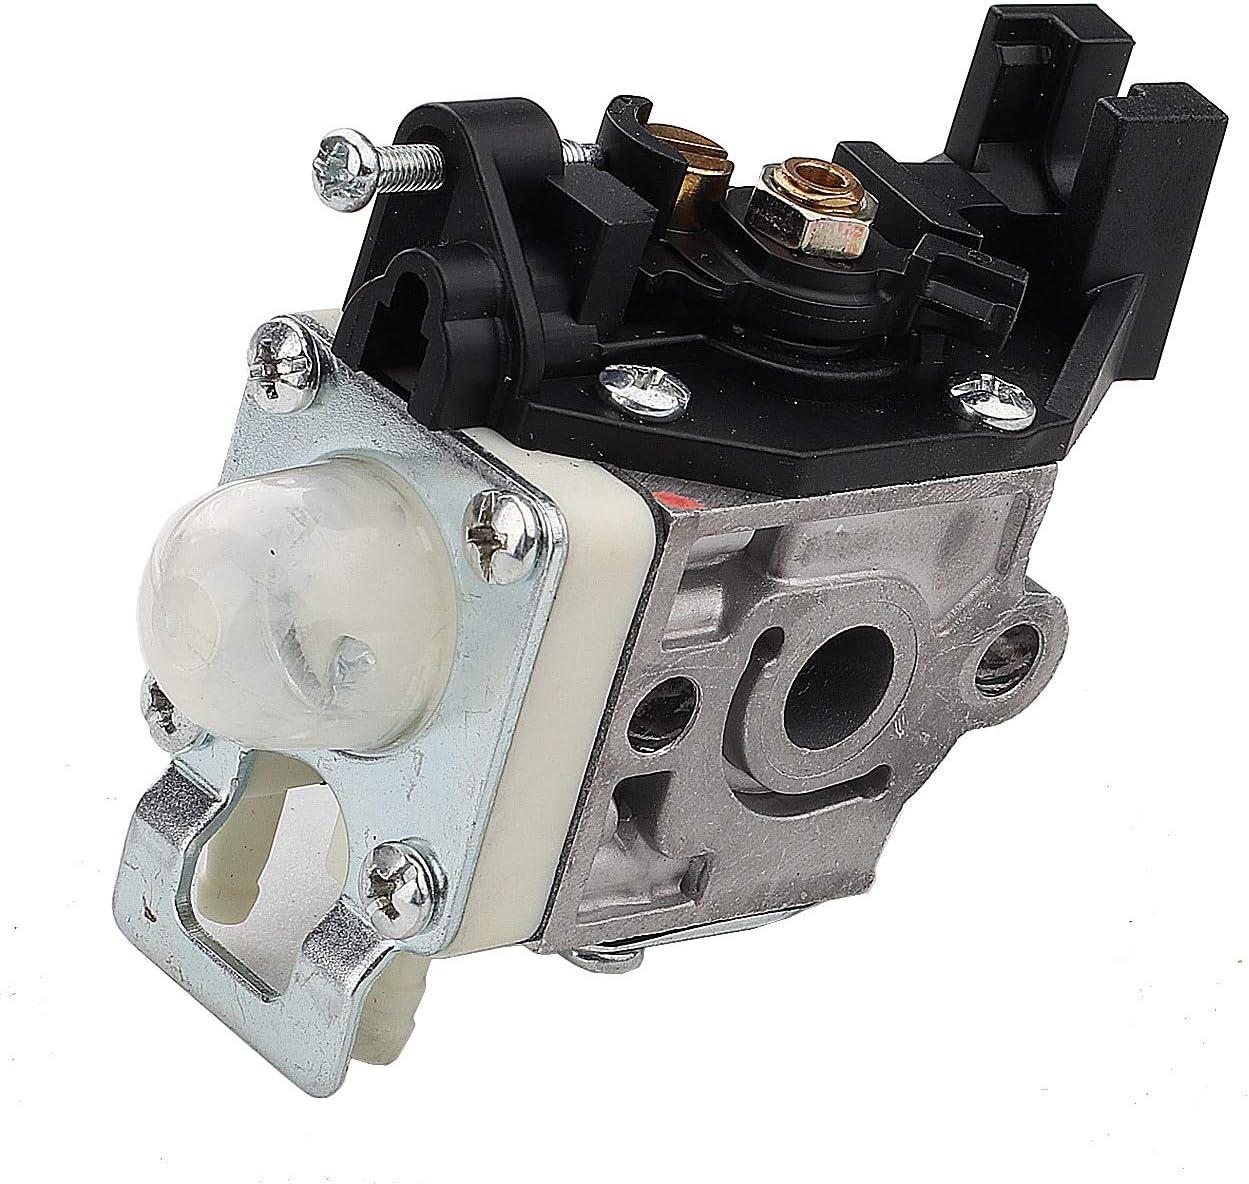 Yermax SRM 225 Carburetor for ZAMA RB-K93 Echo SRM-225 GT-225 PAS-225 GT-225 SRM-225i SRM-225U SRM-225SB PE-225 SHC-225